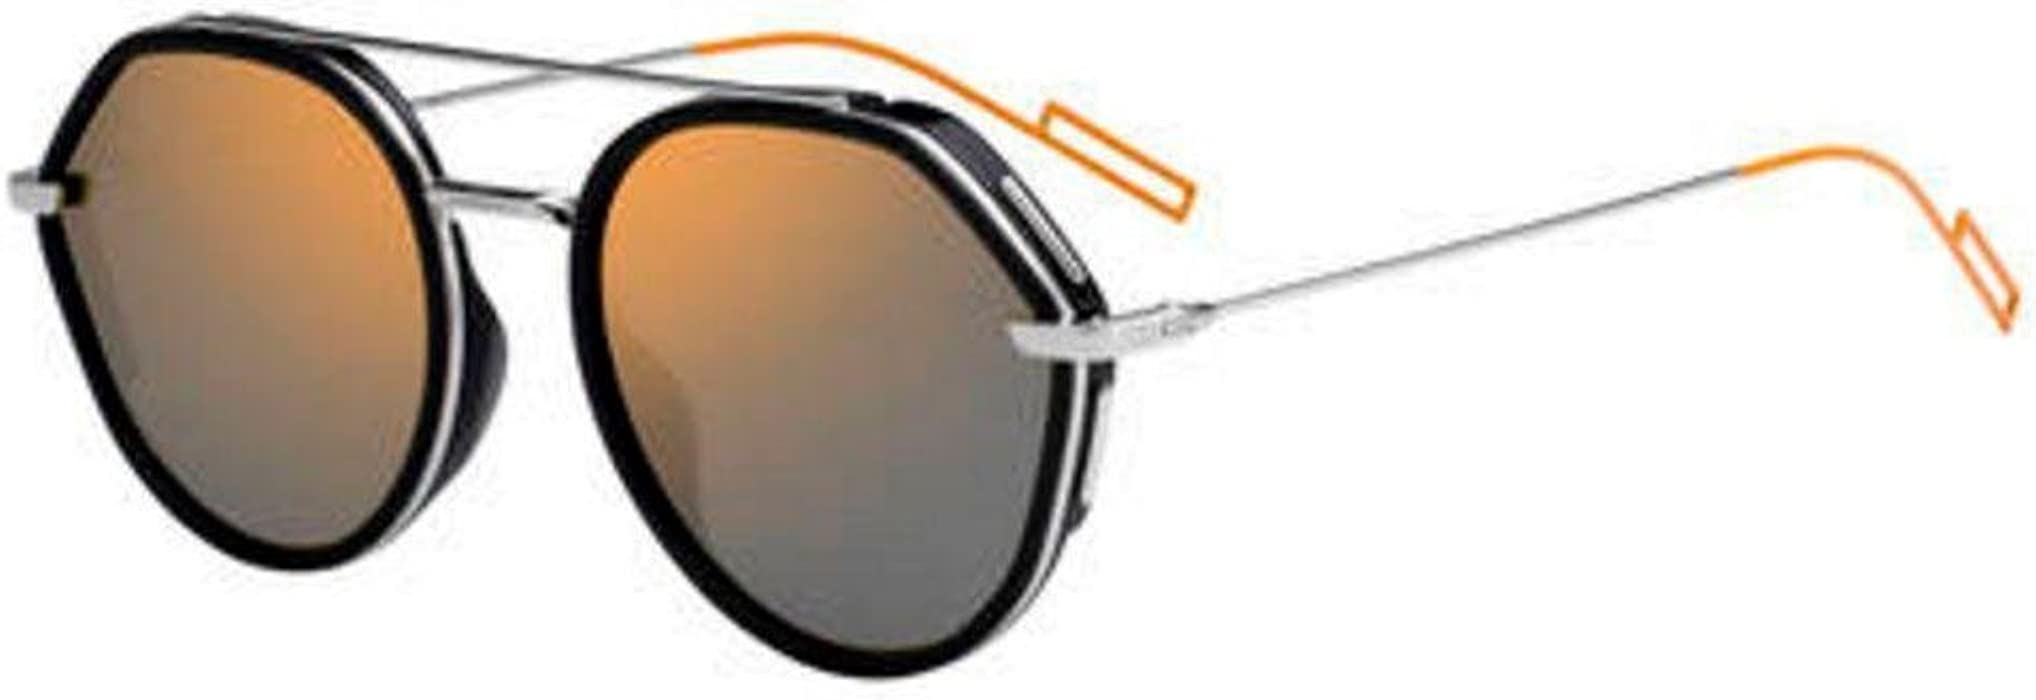 d0052b16e1b Amazon.com  New Christian Dior Homme 0219S 0CSA 83 Black Palladium  Sunglasses  Clothing